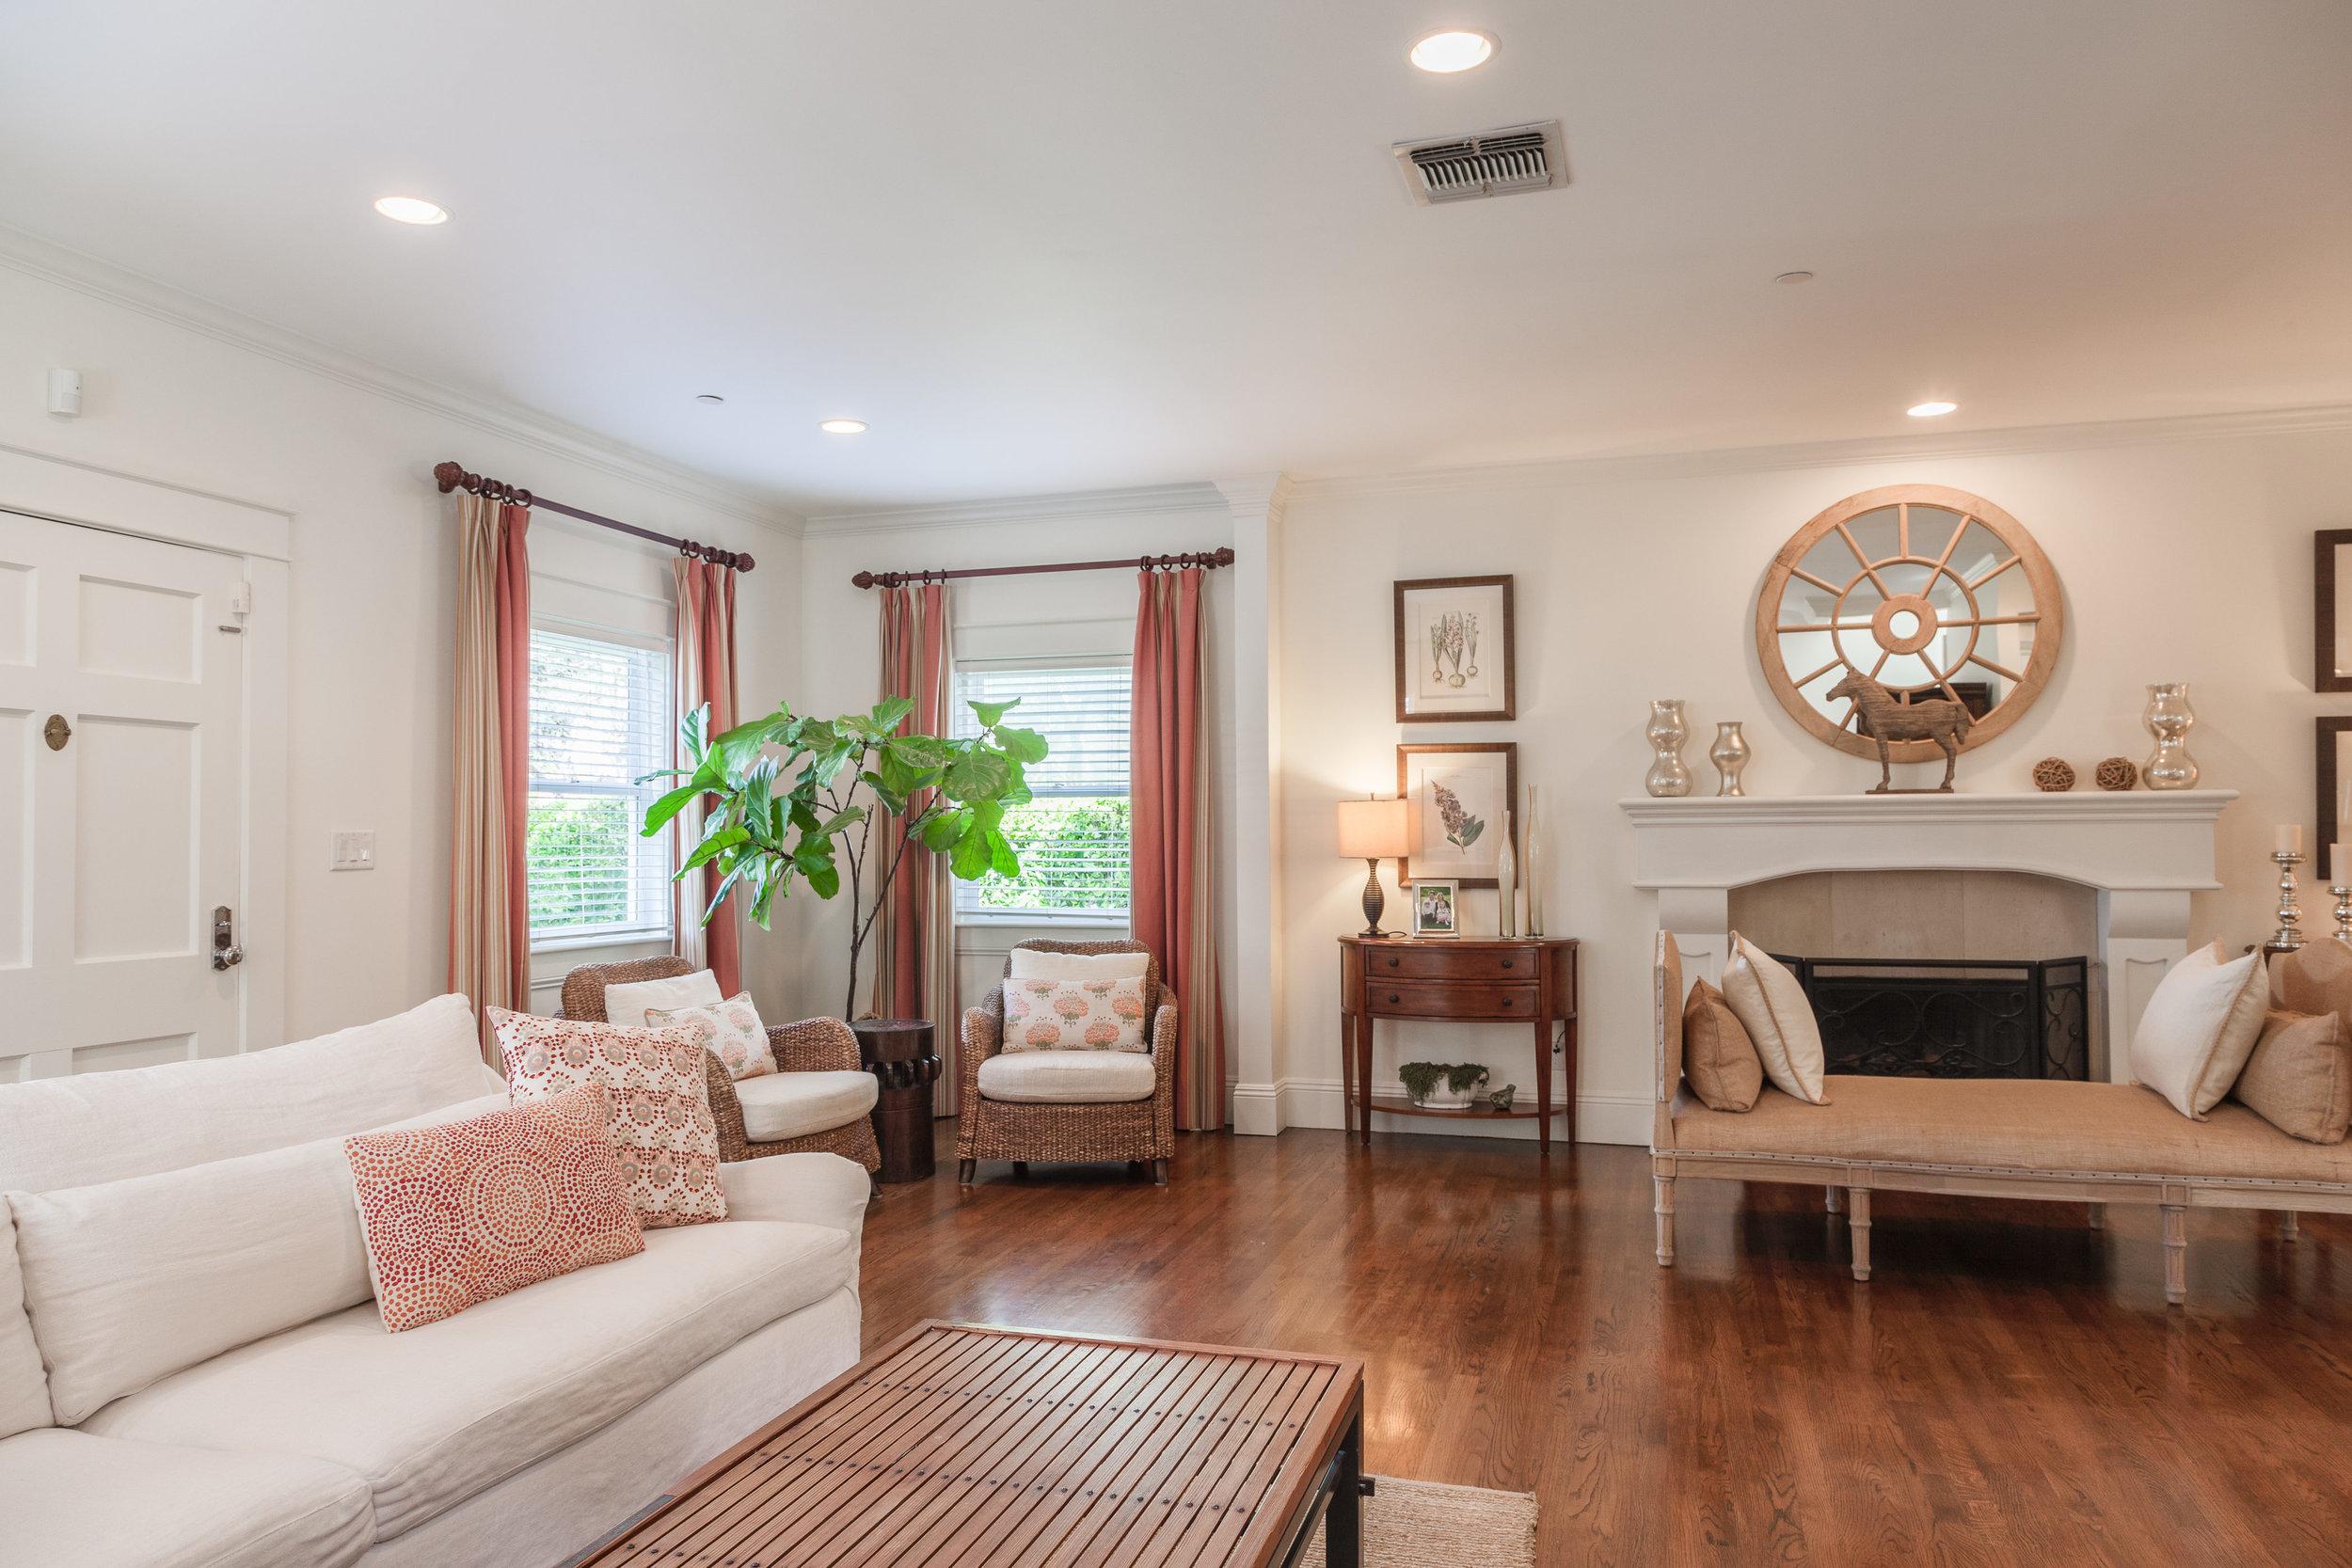 3163 La Suvida Dr Los Angeles-print-004-Living Room-4200x2800-300dpi.jpg